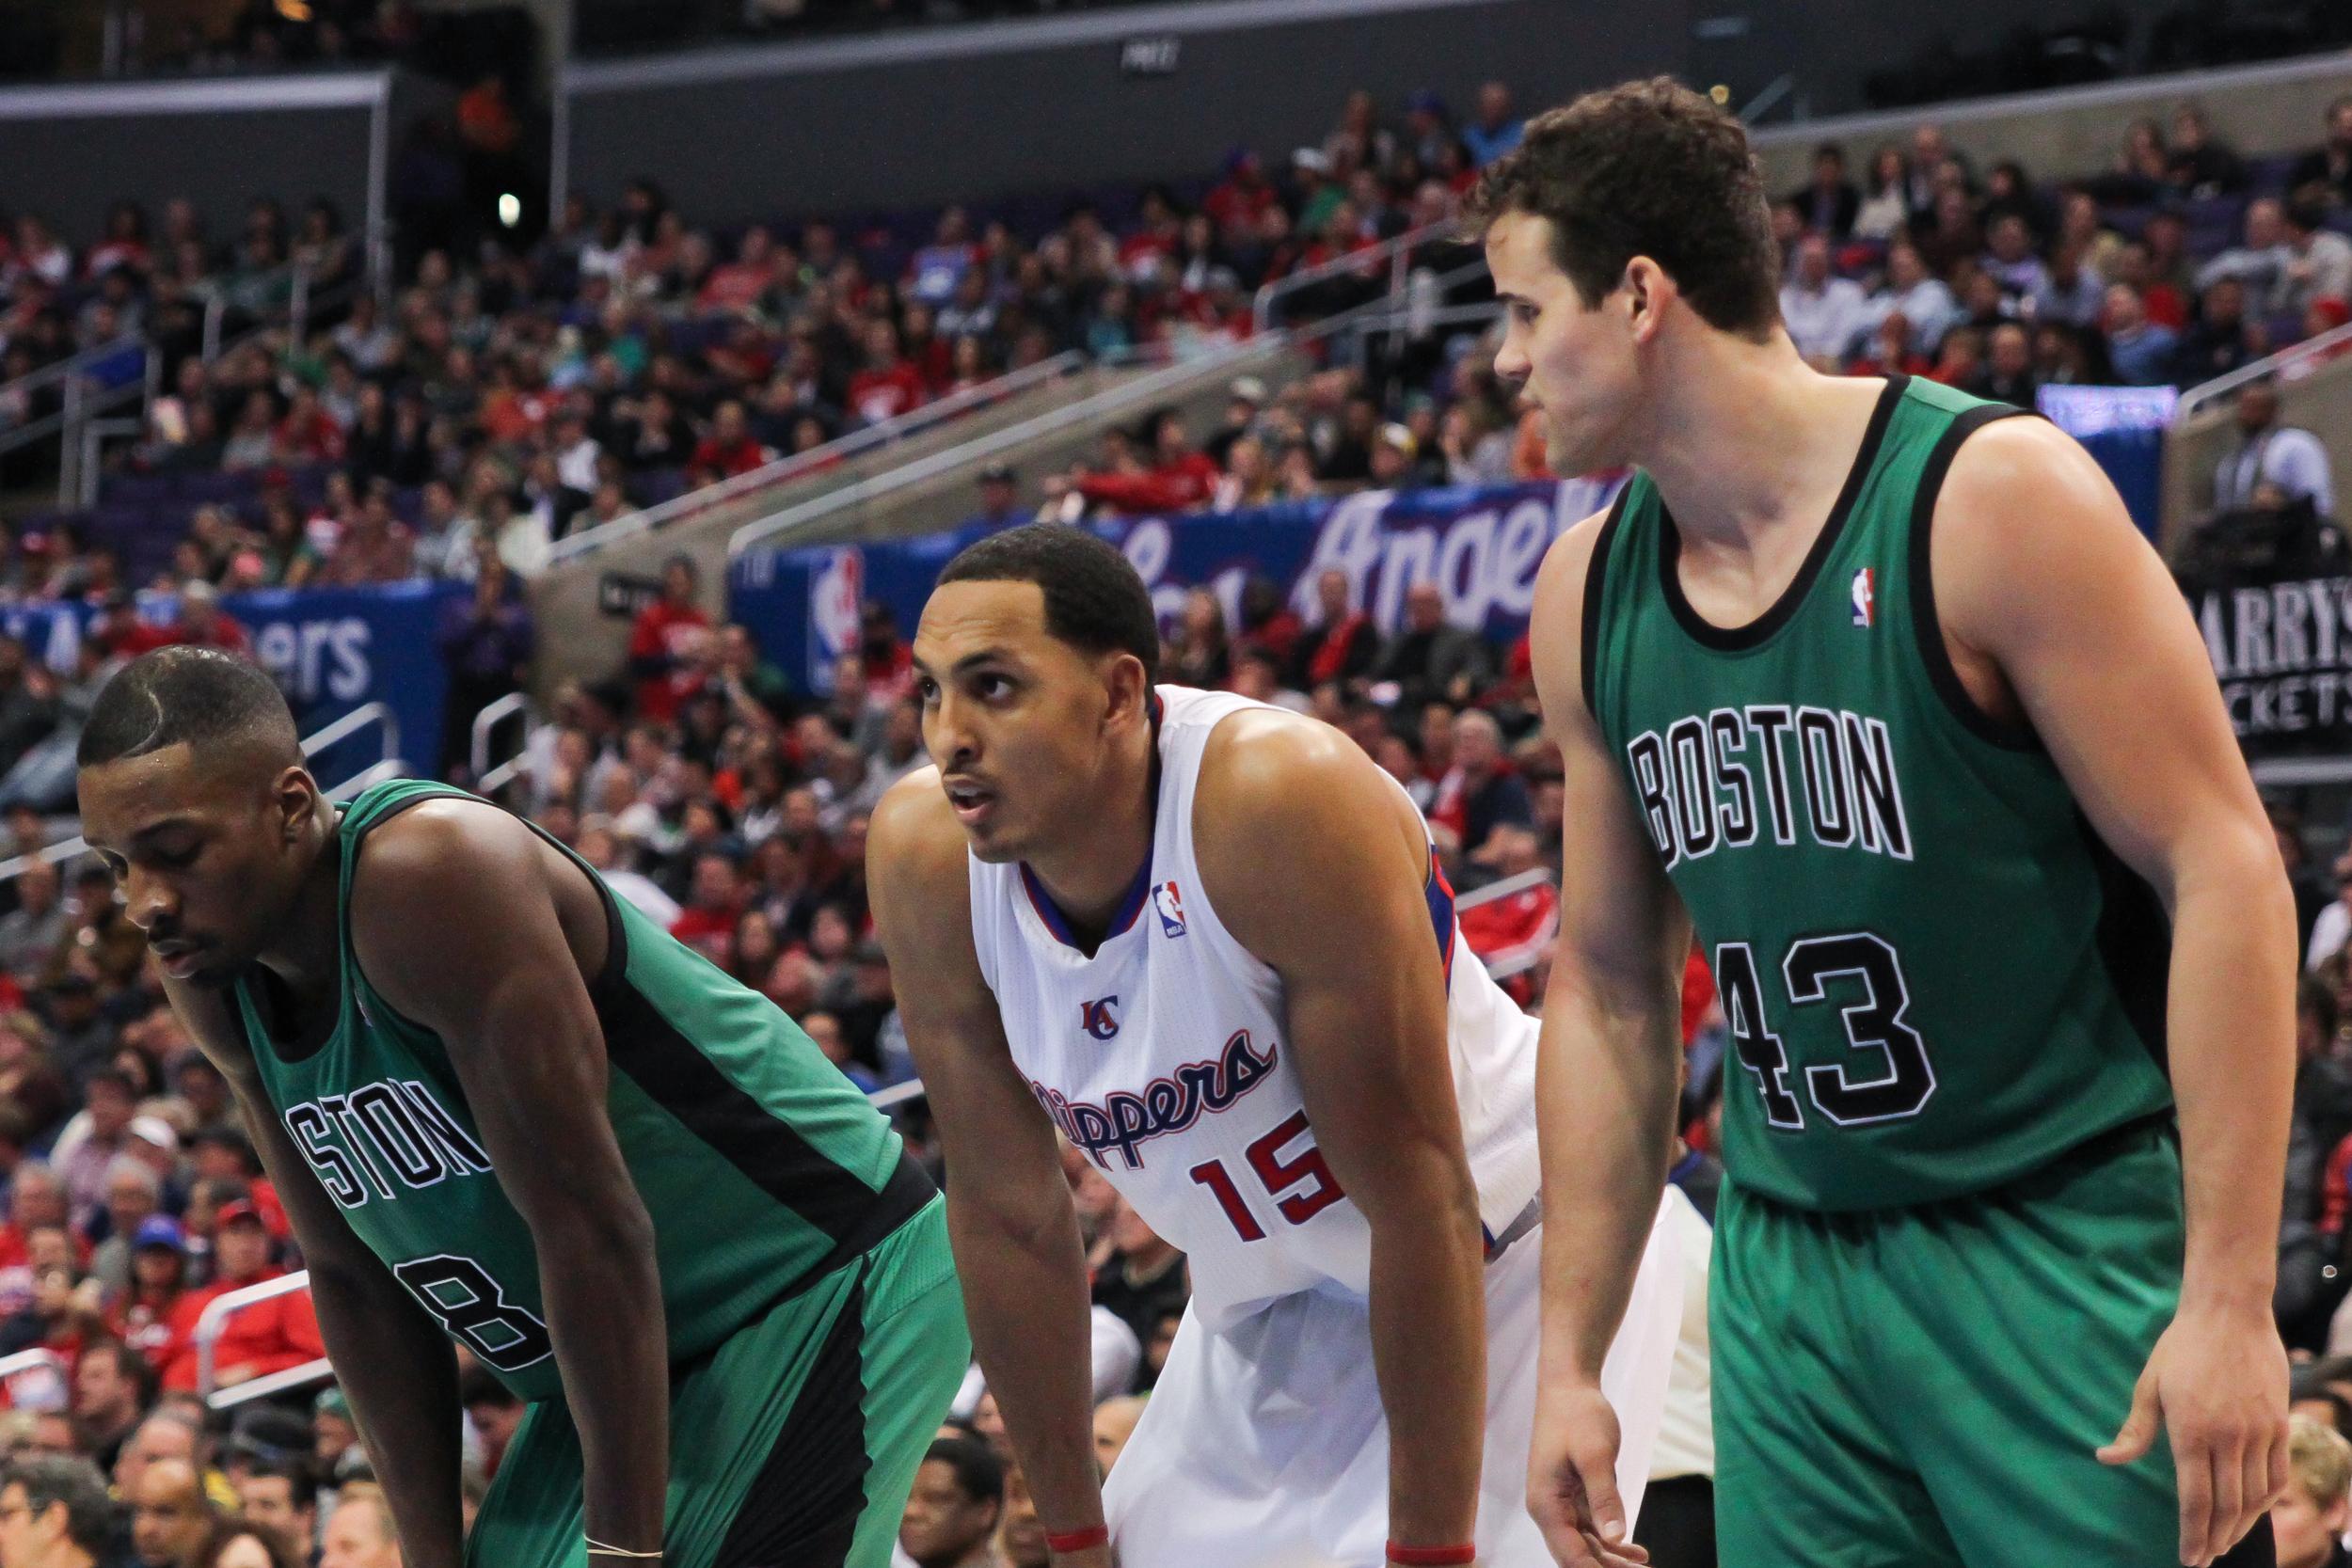 Photo by Varon P. Celtics-37.jpg